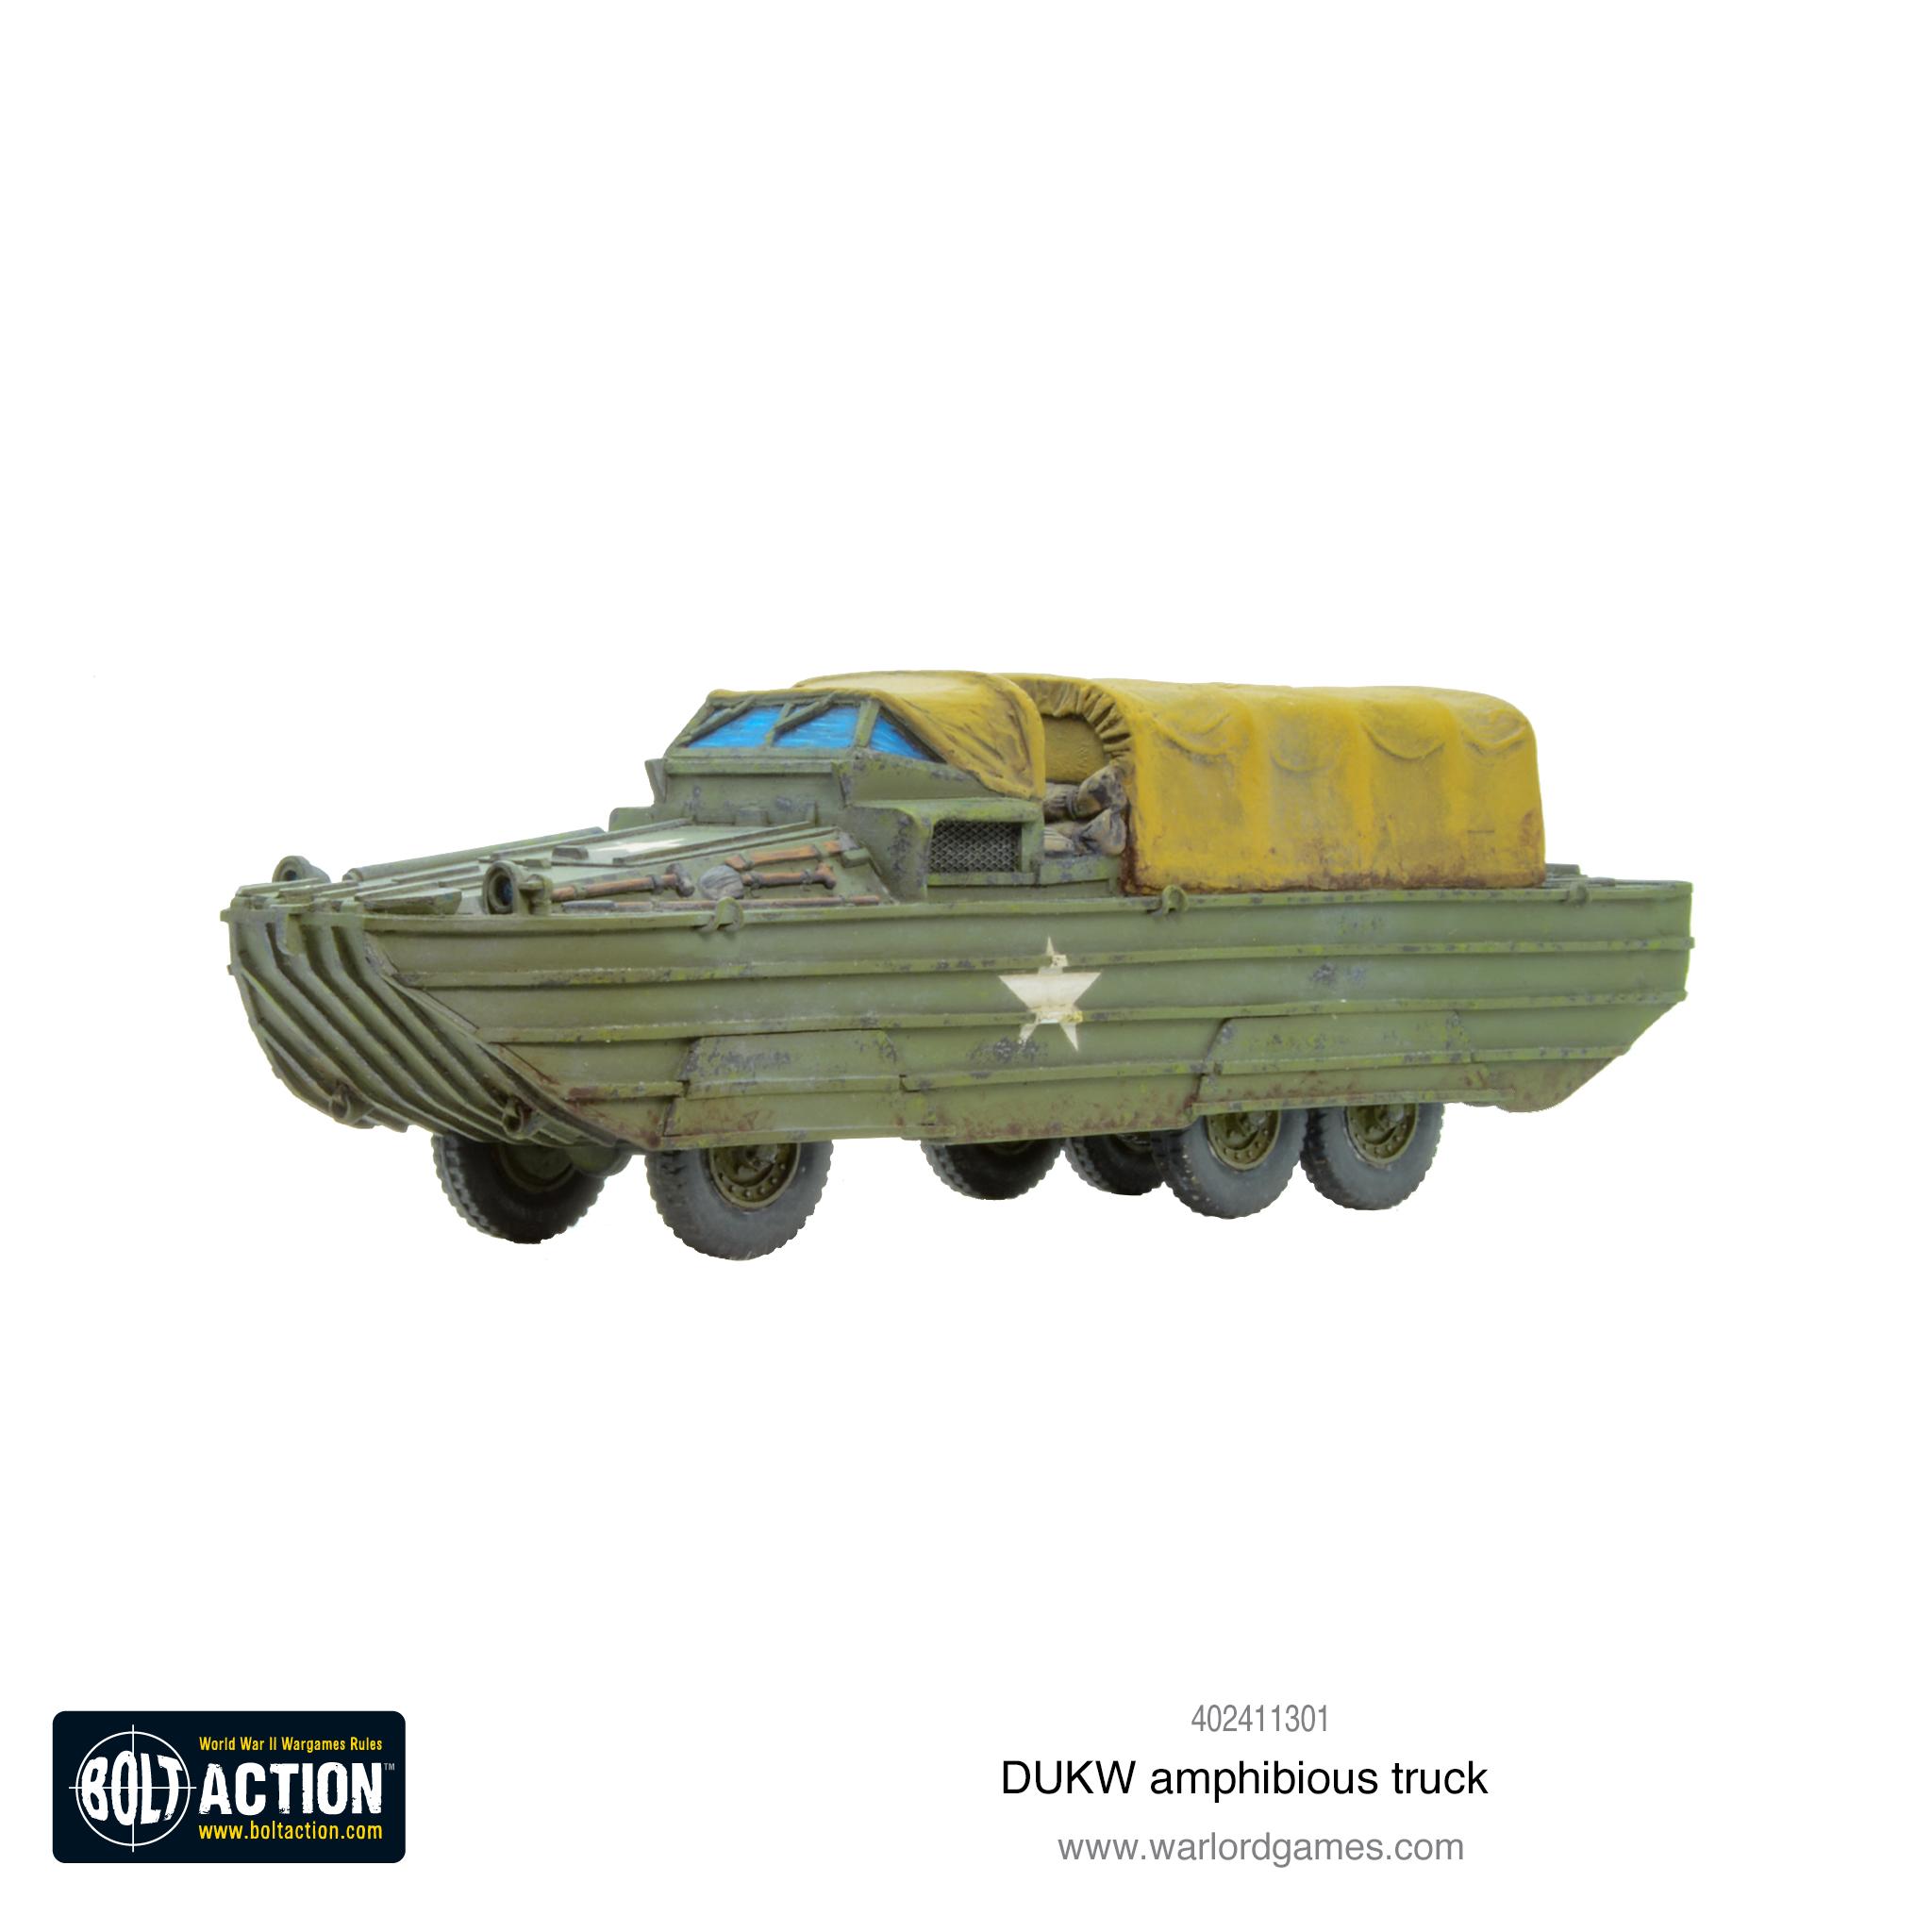 DUKW Amphibious Transport